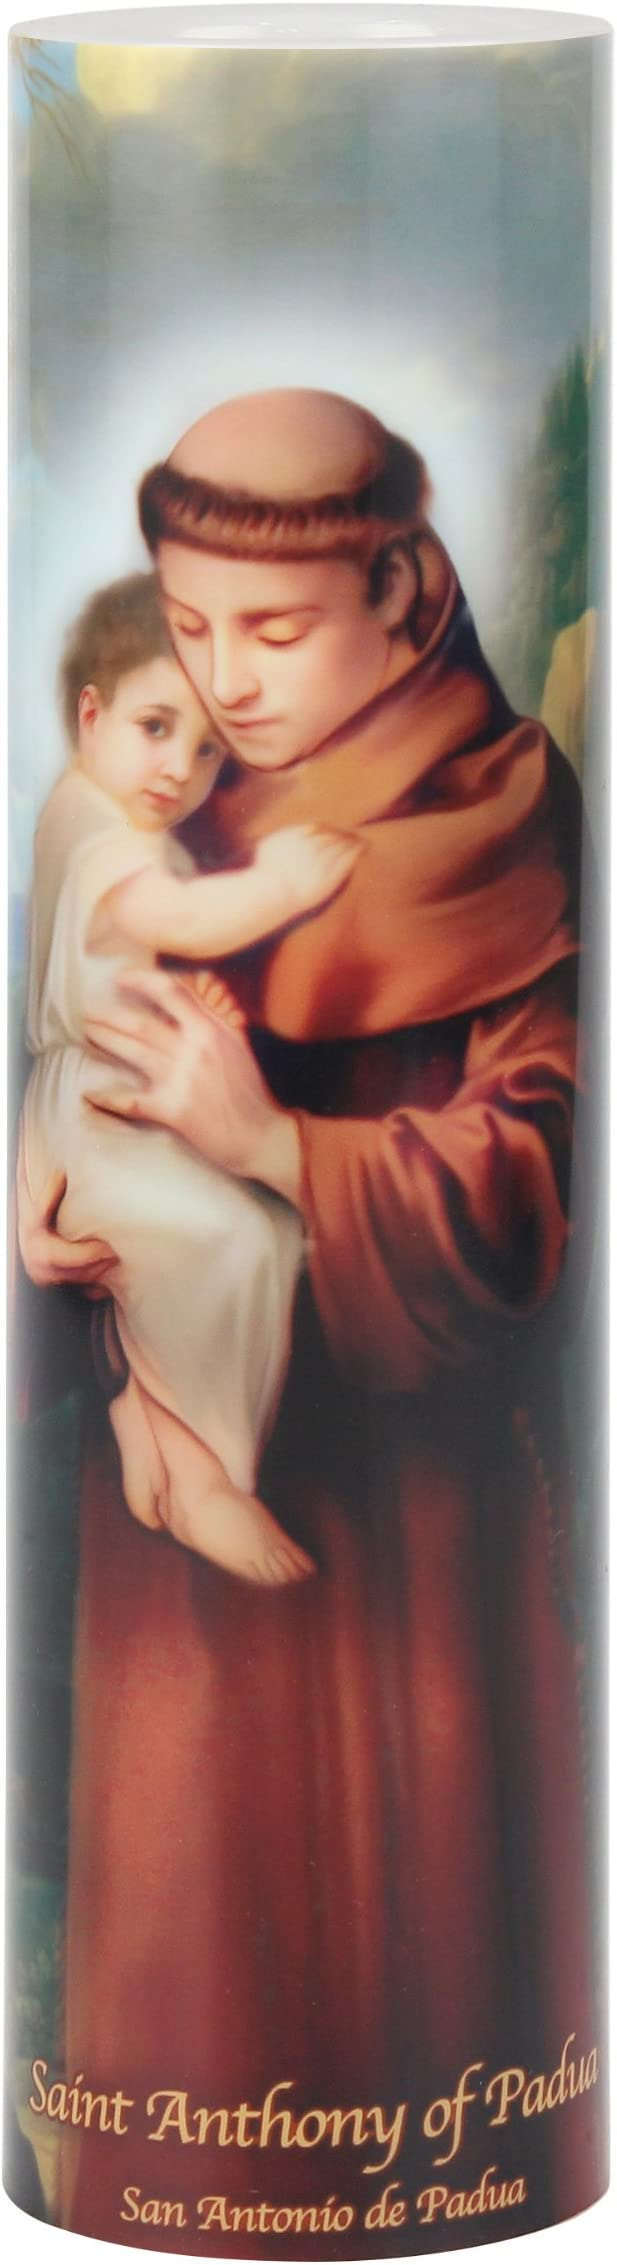 St Antony of Padua New  Devotional Religious Saint LED Flameless Prayer Candle